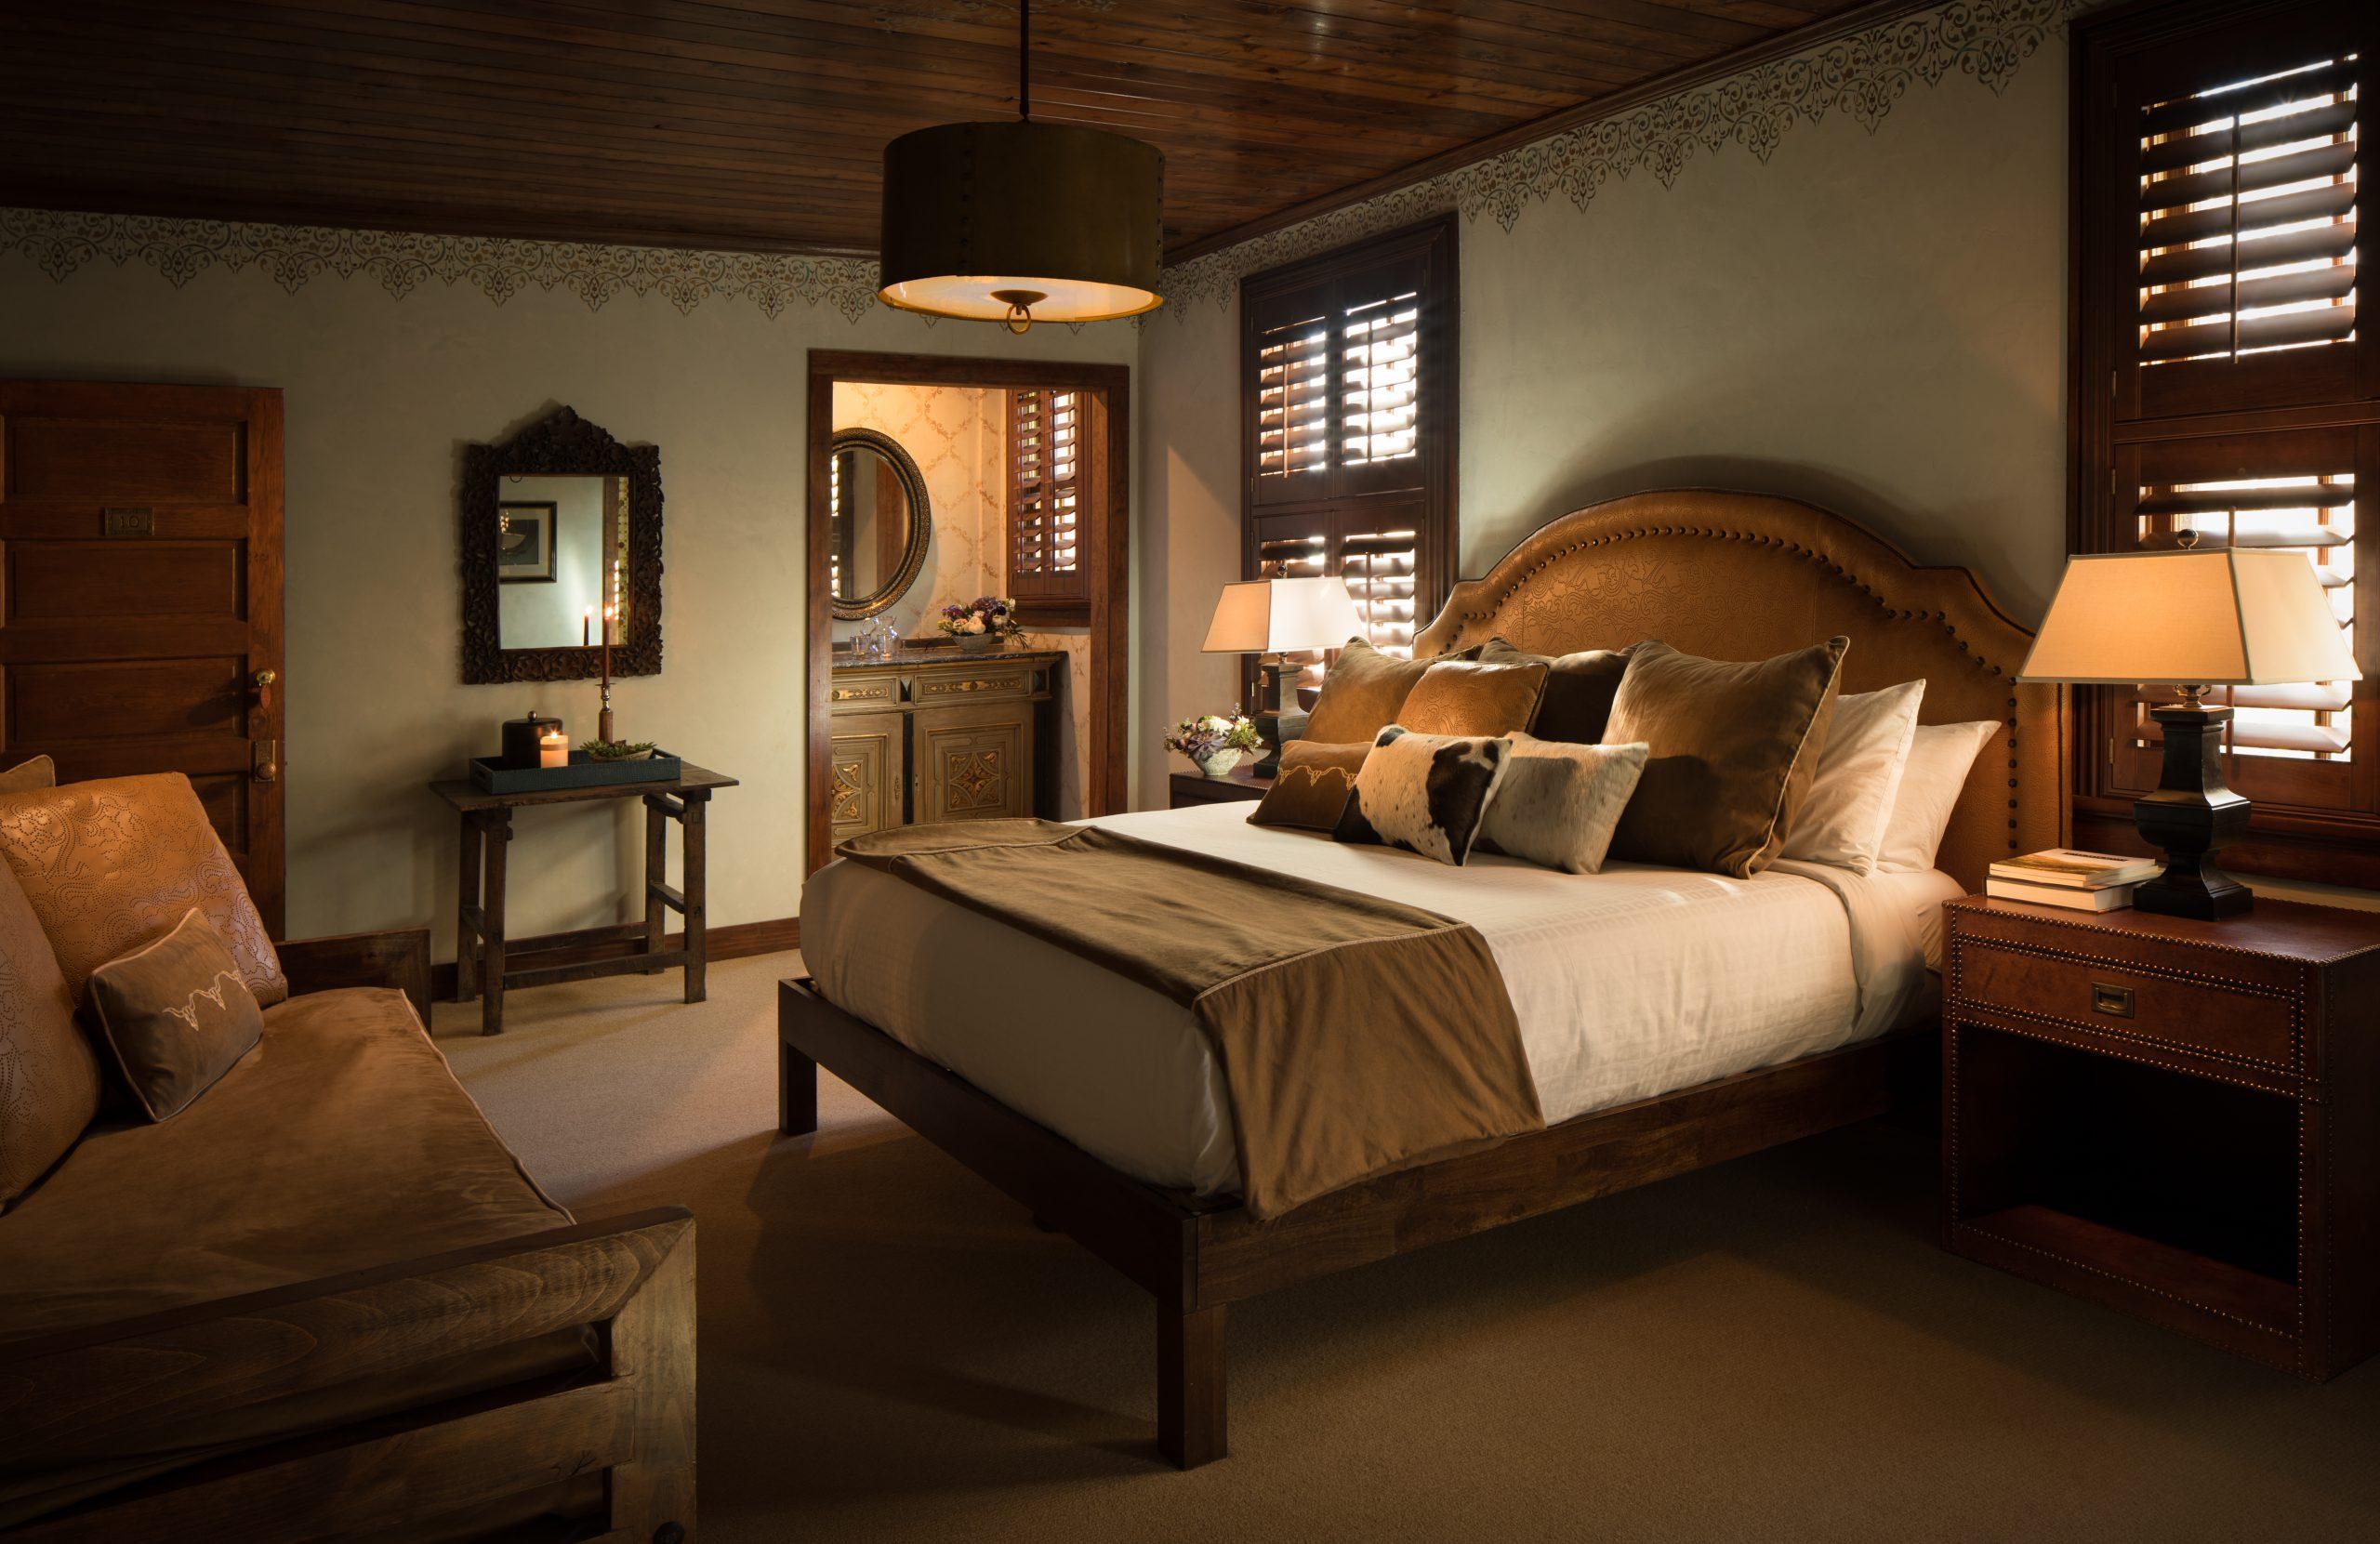 JRP_Historic Hotel Room 2